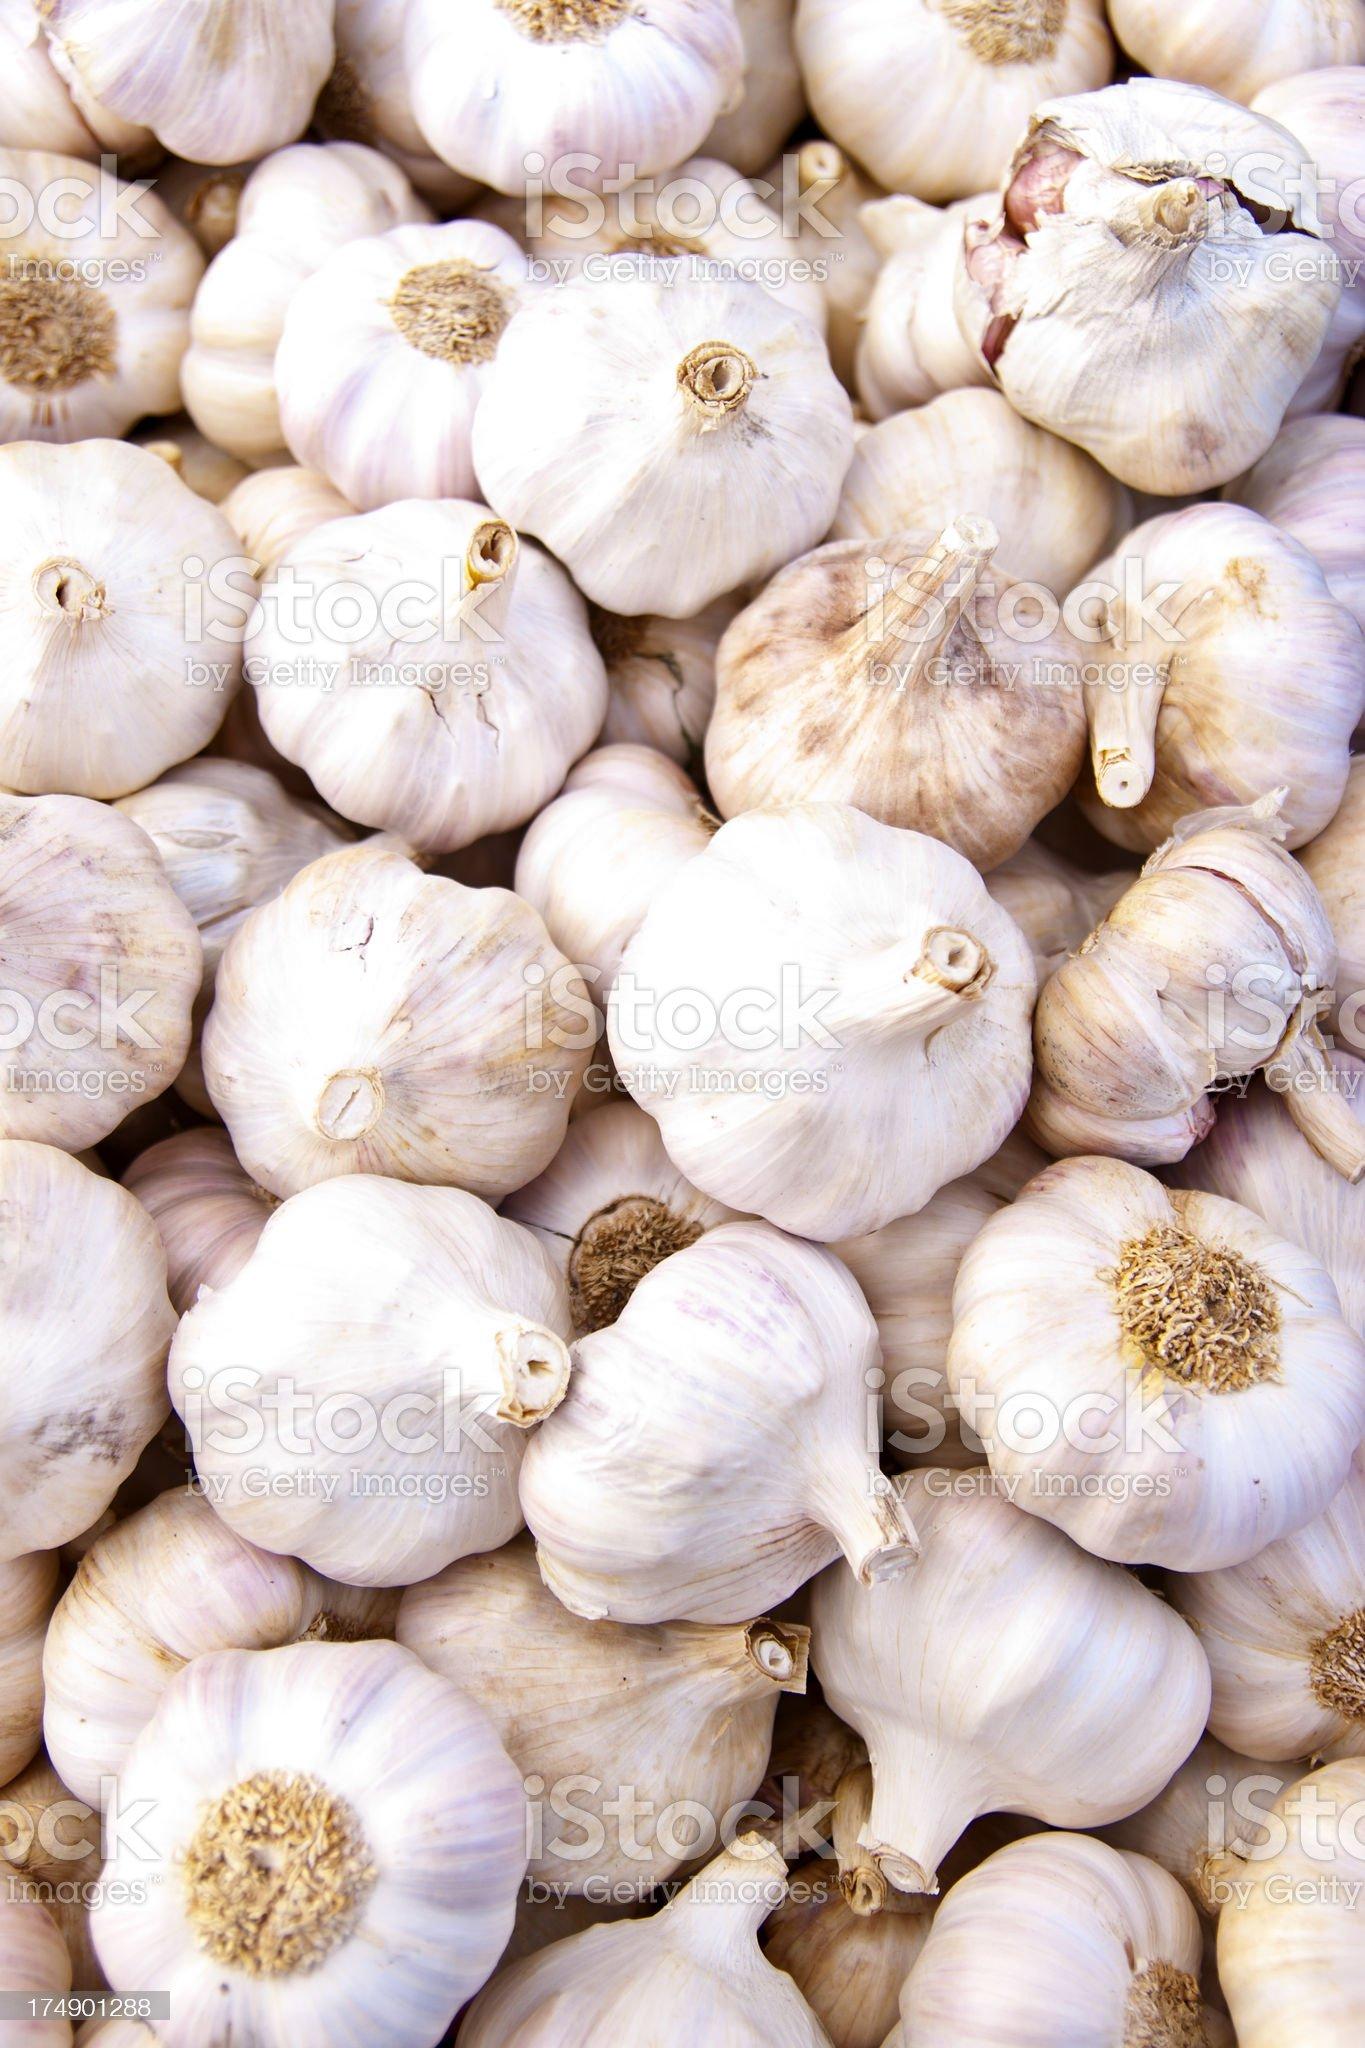 Pile of Garlic royalty-free stock photo